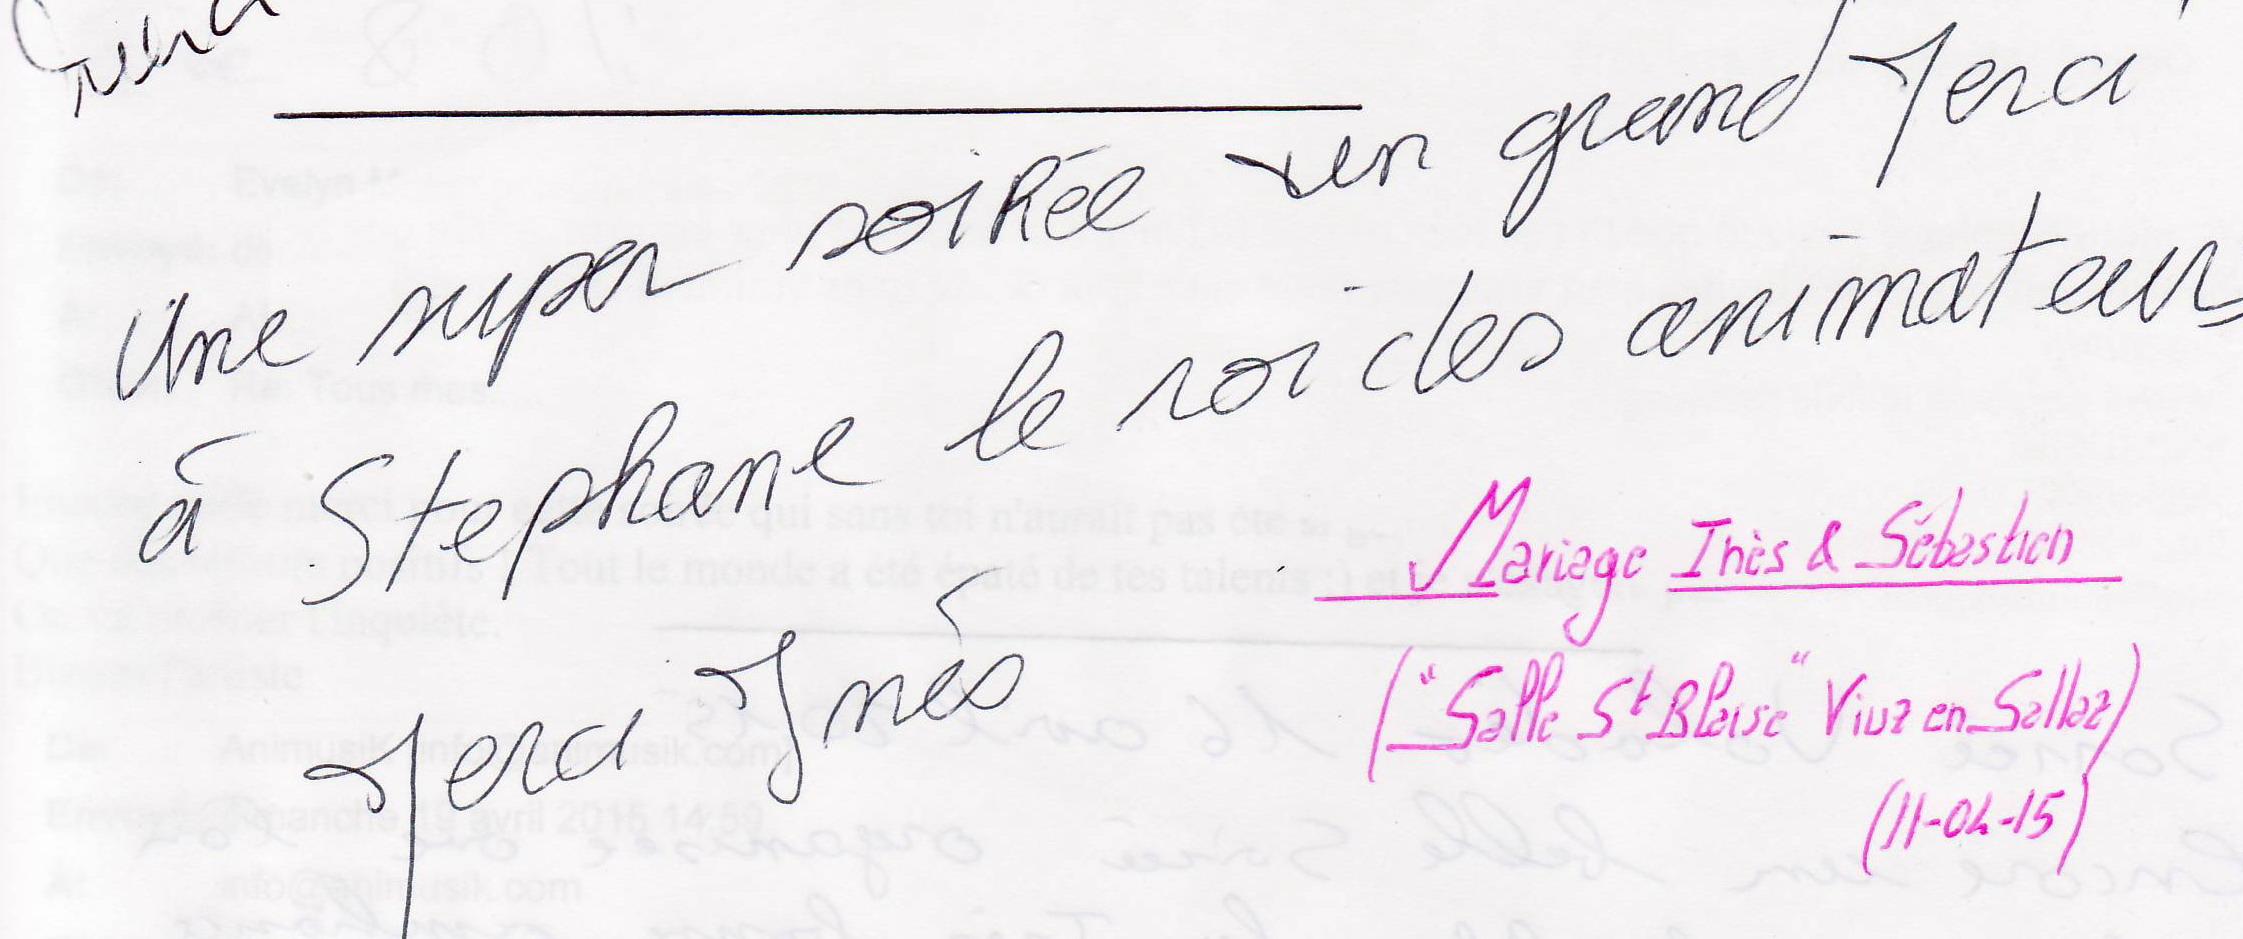 Mariage_GALLIE_Sébastien_&_Inès_(Salle_Saint-Blaise_Viuz_en_Sallaz)_(11-04-2015)